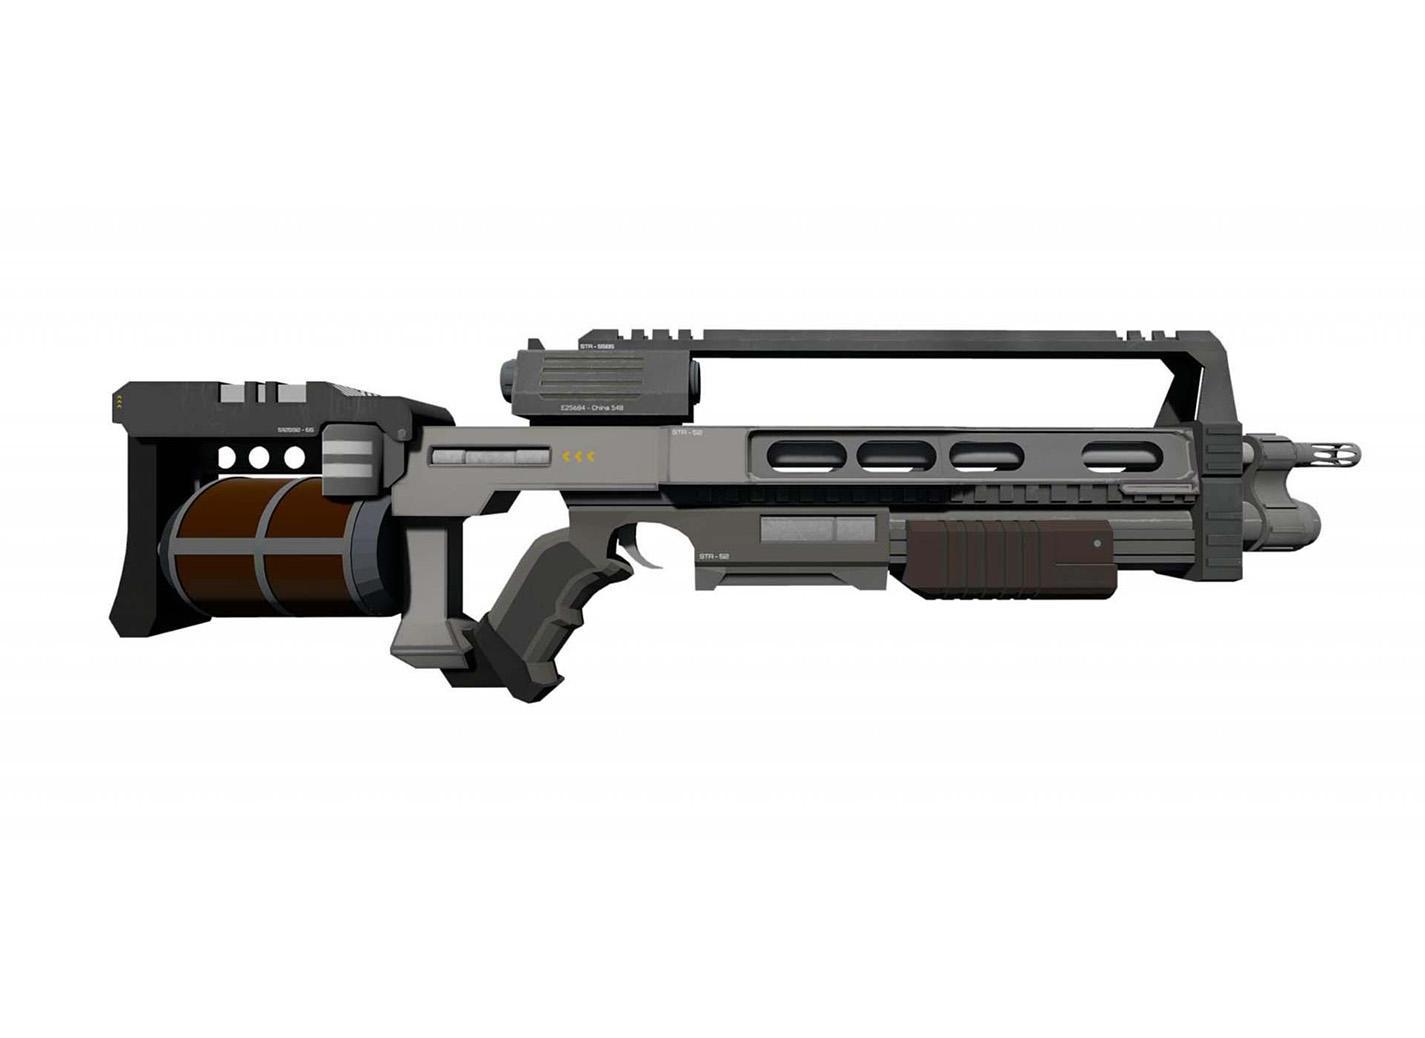 STA-52